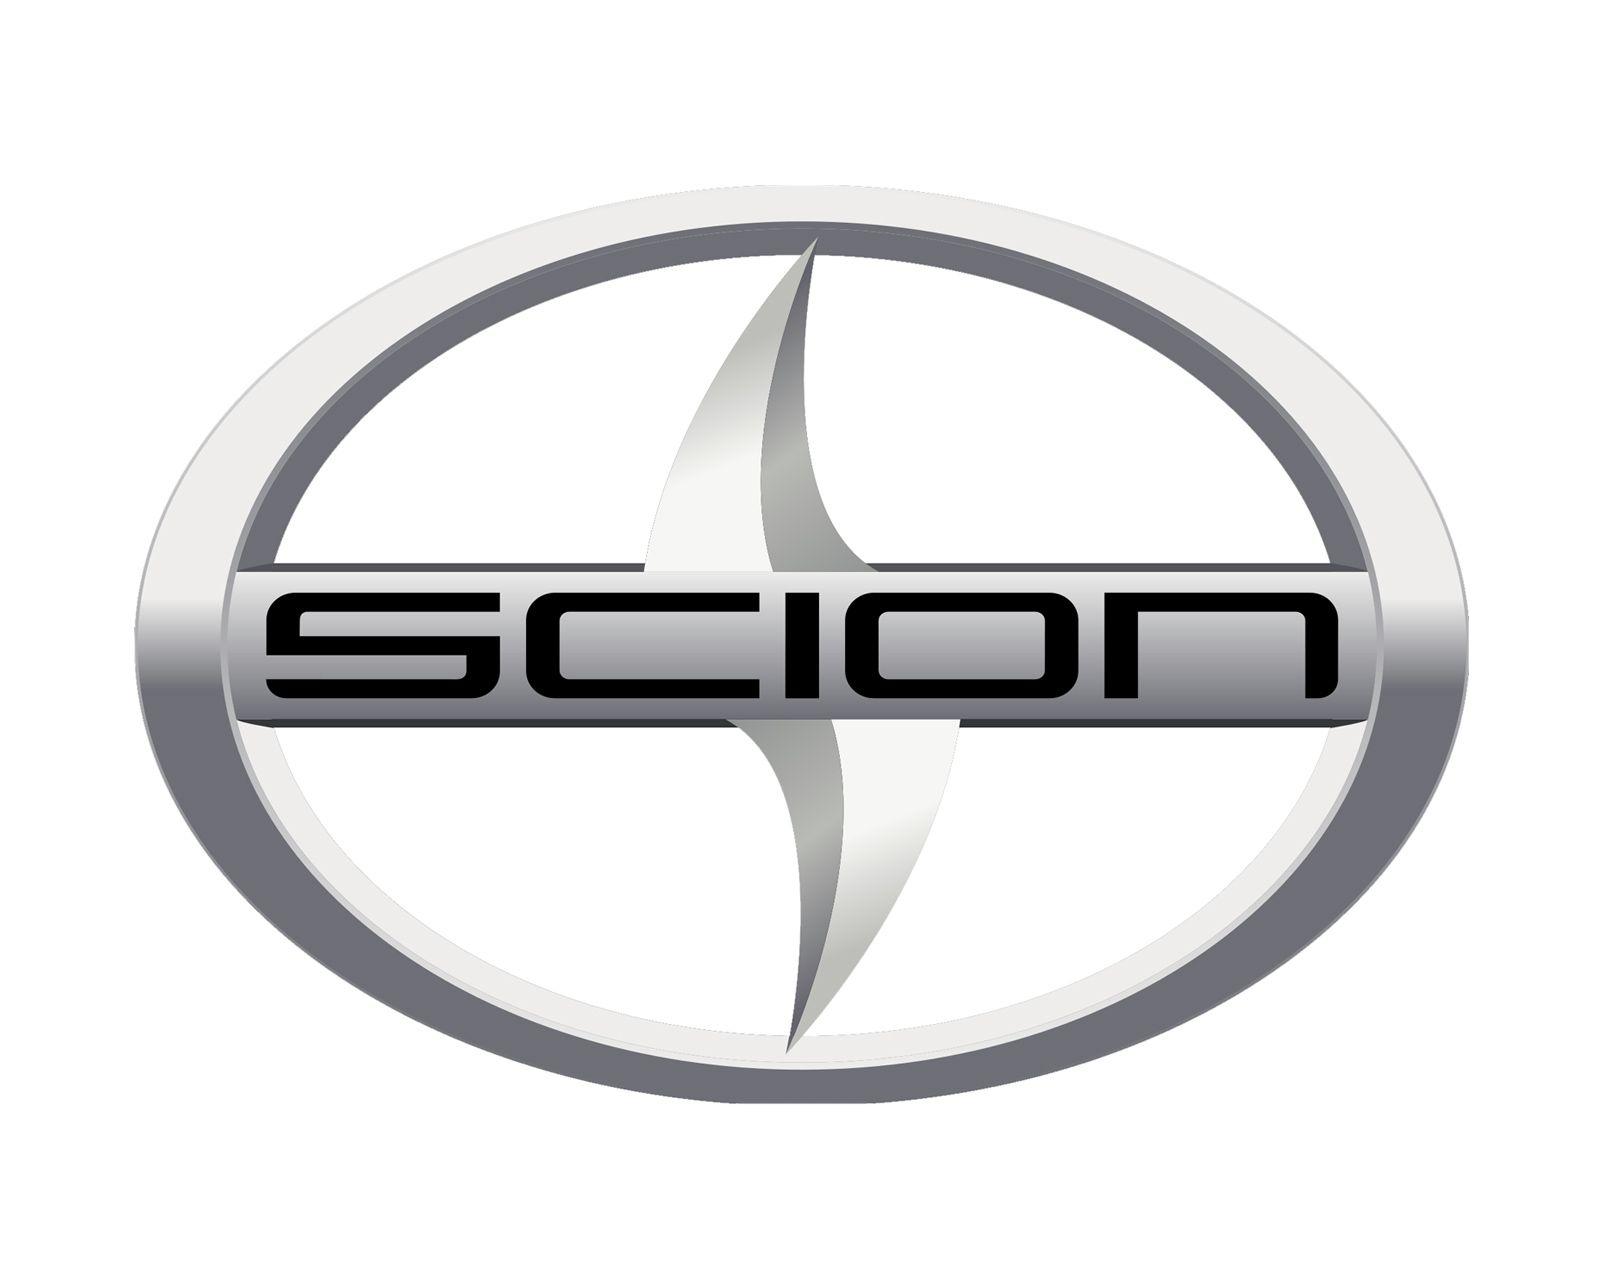 Large Scion Car Logo Scion Cars Car Logos Scion